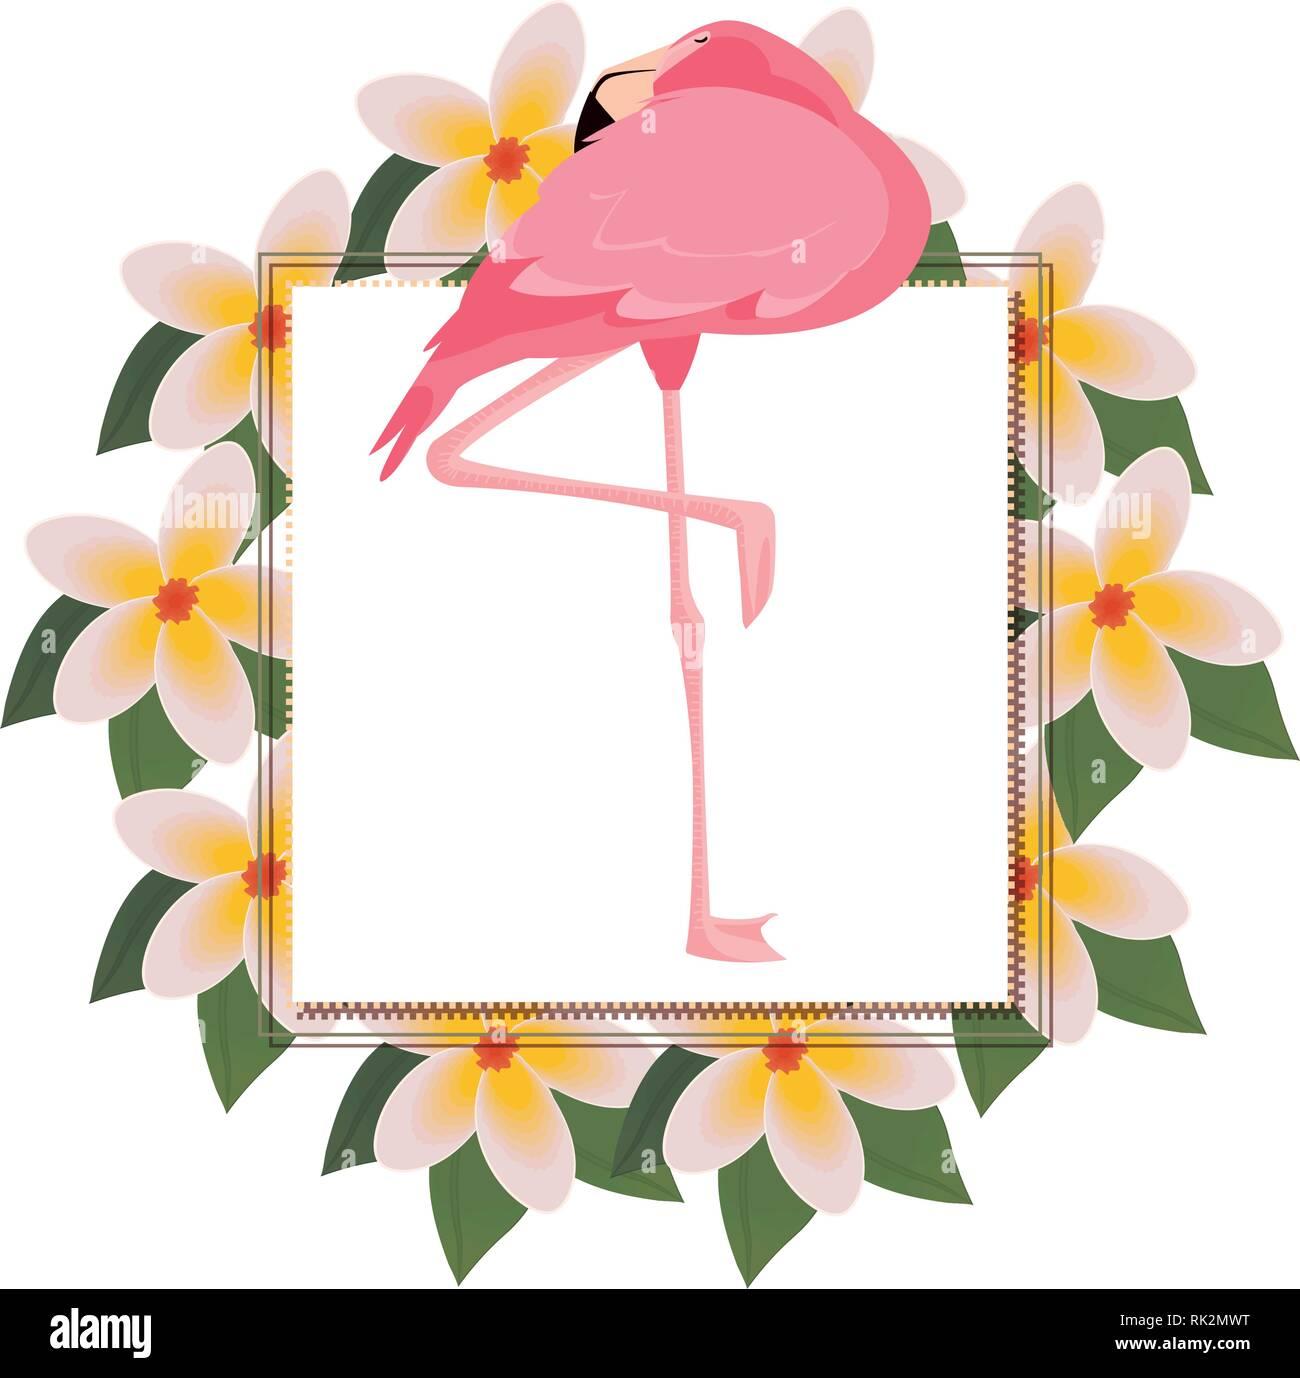 Flower Wreath Illustration Photos Flower Wreath Illustration